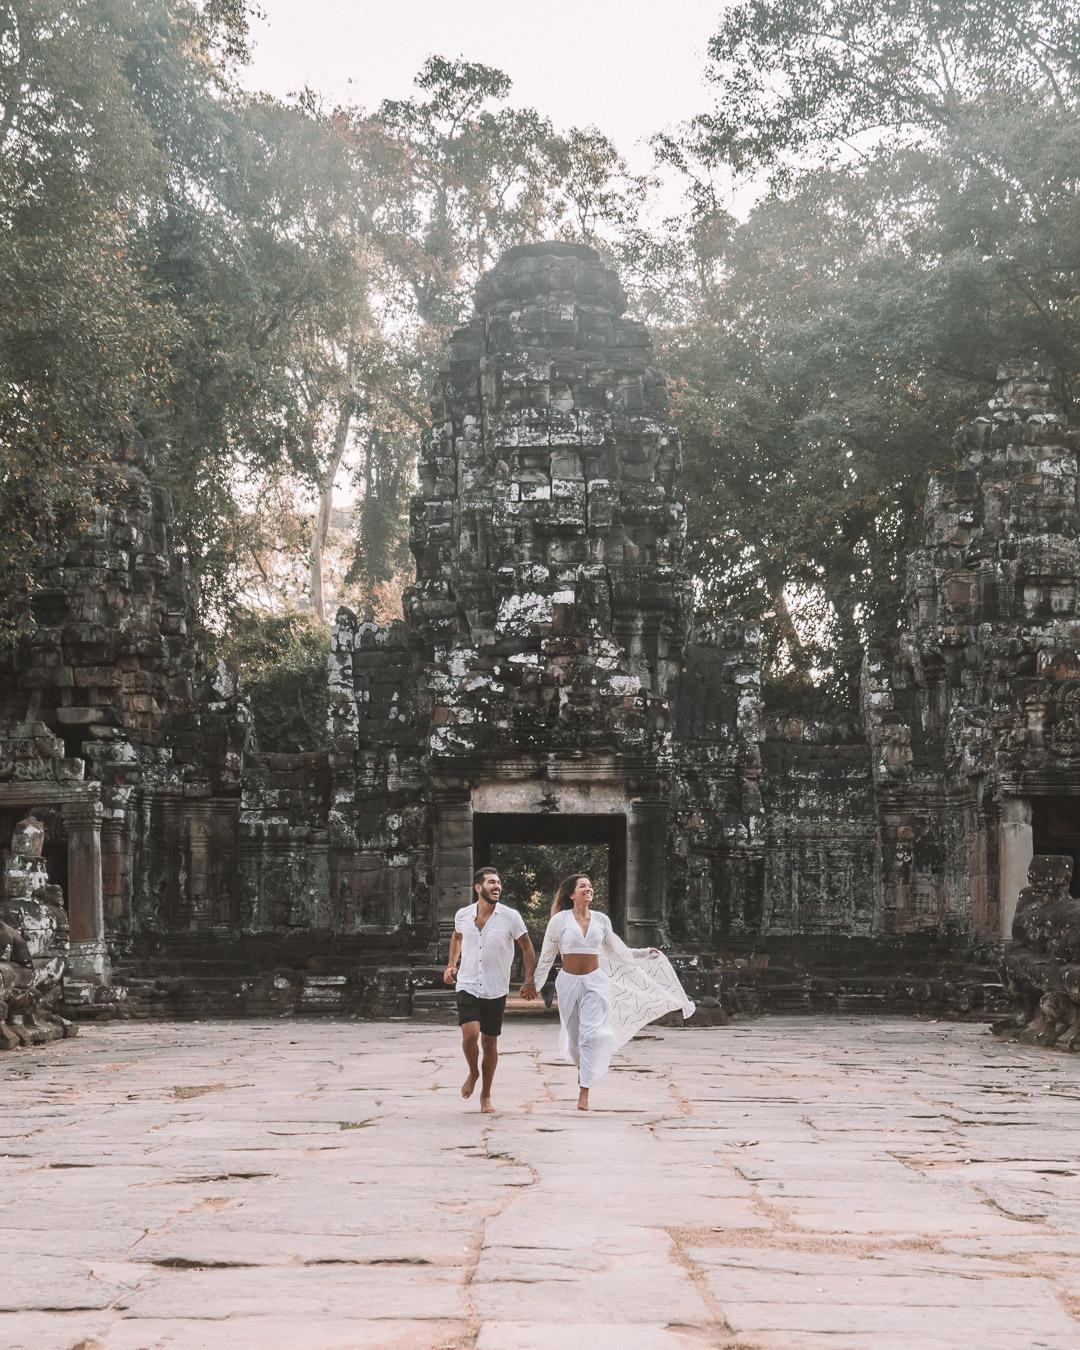 exploring temples cambodia patricia miguel freeoversea instagram